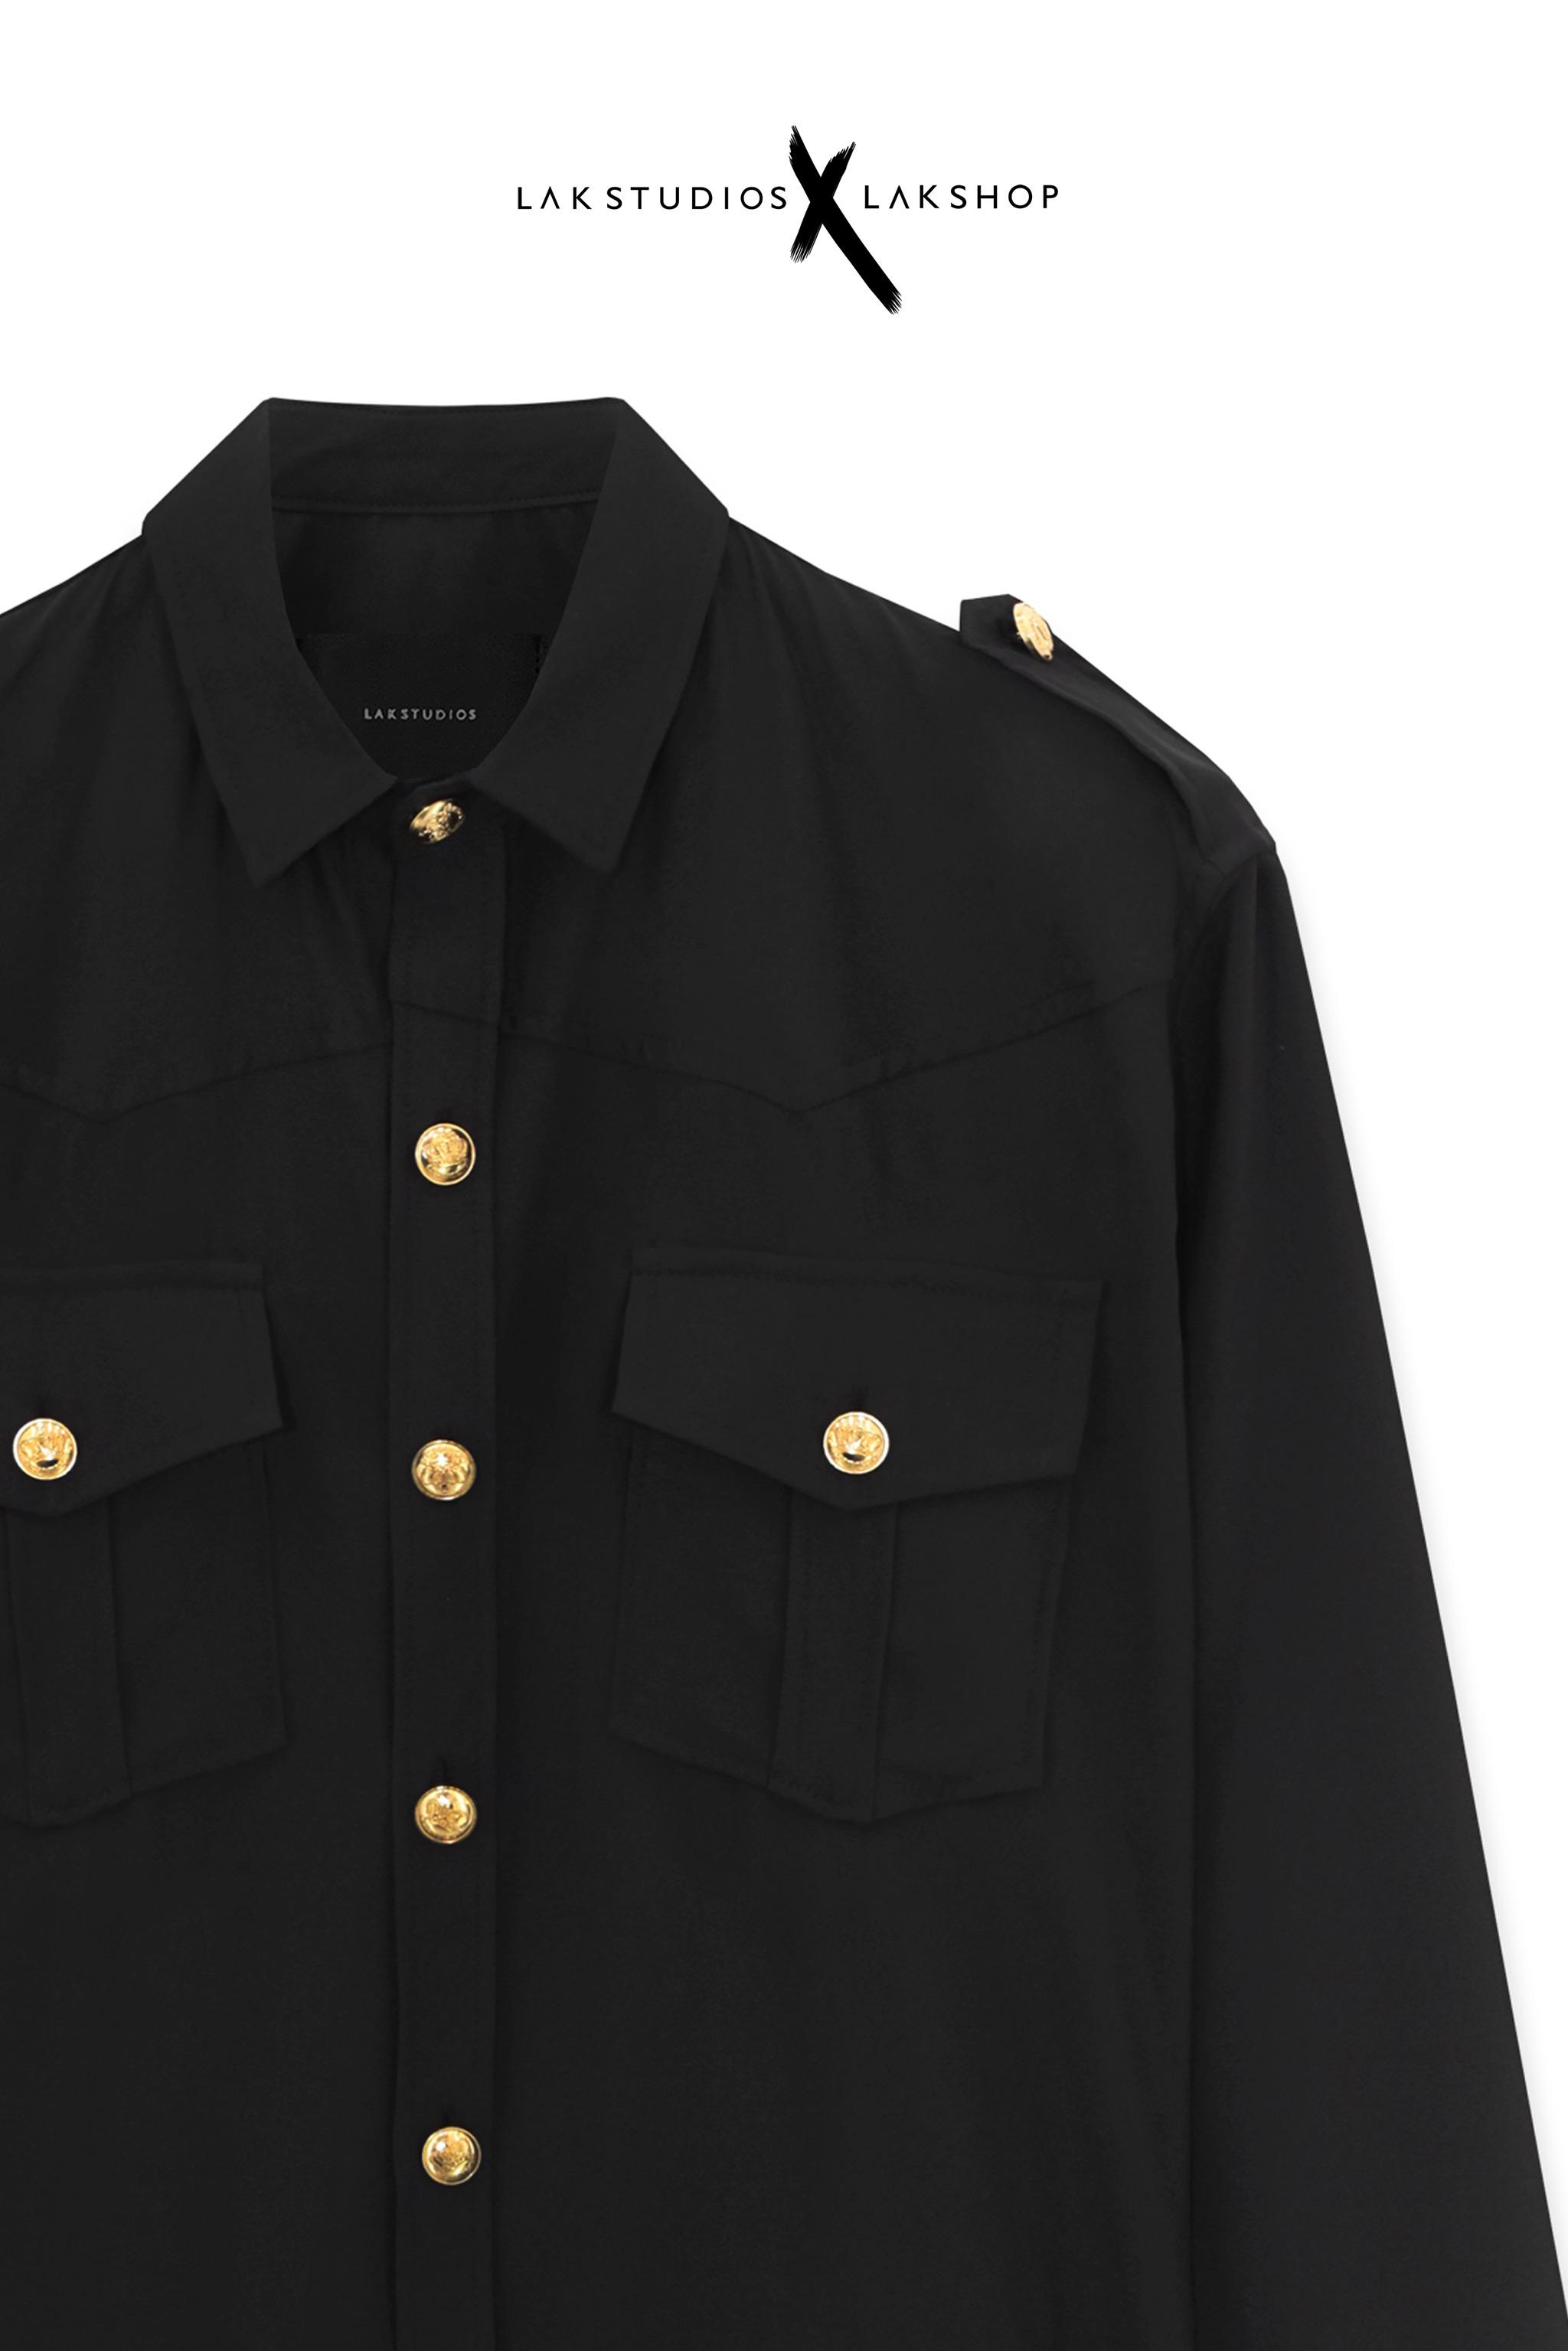 Lak Studios Leopard Black Silk Shirt cv1